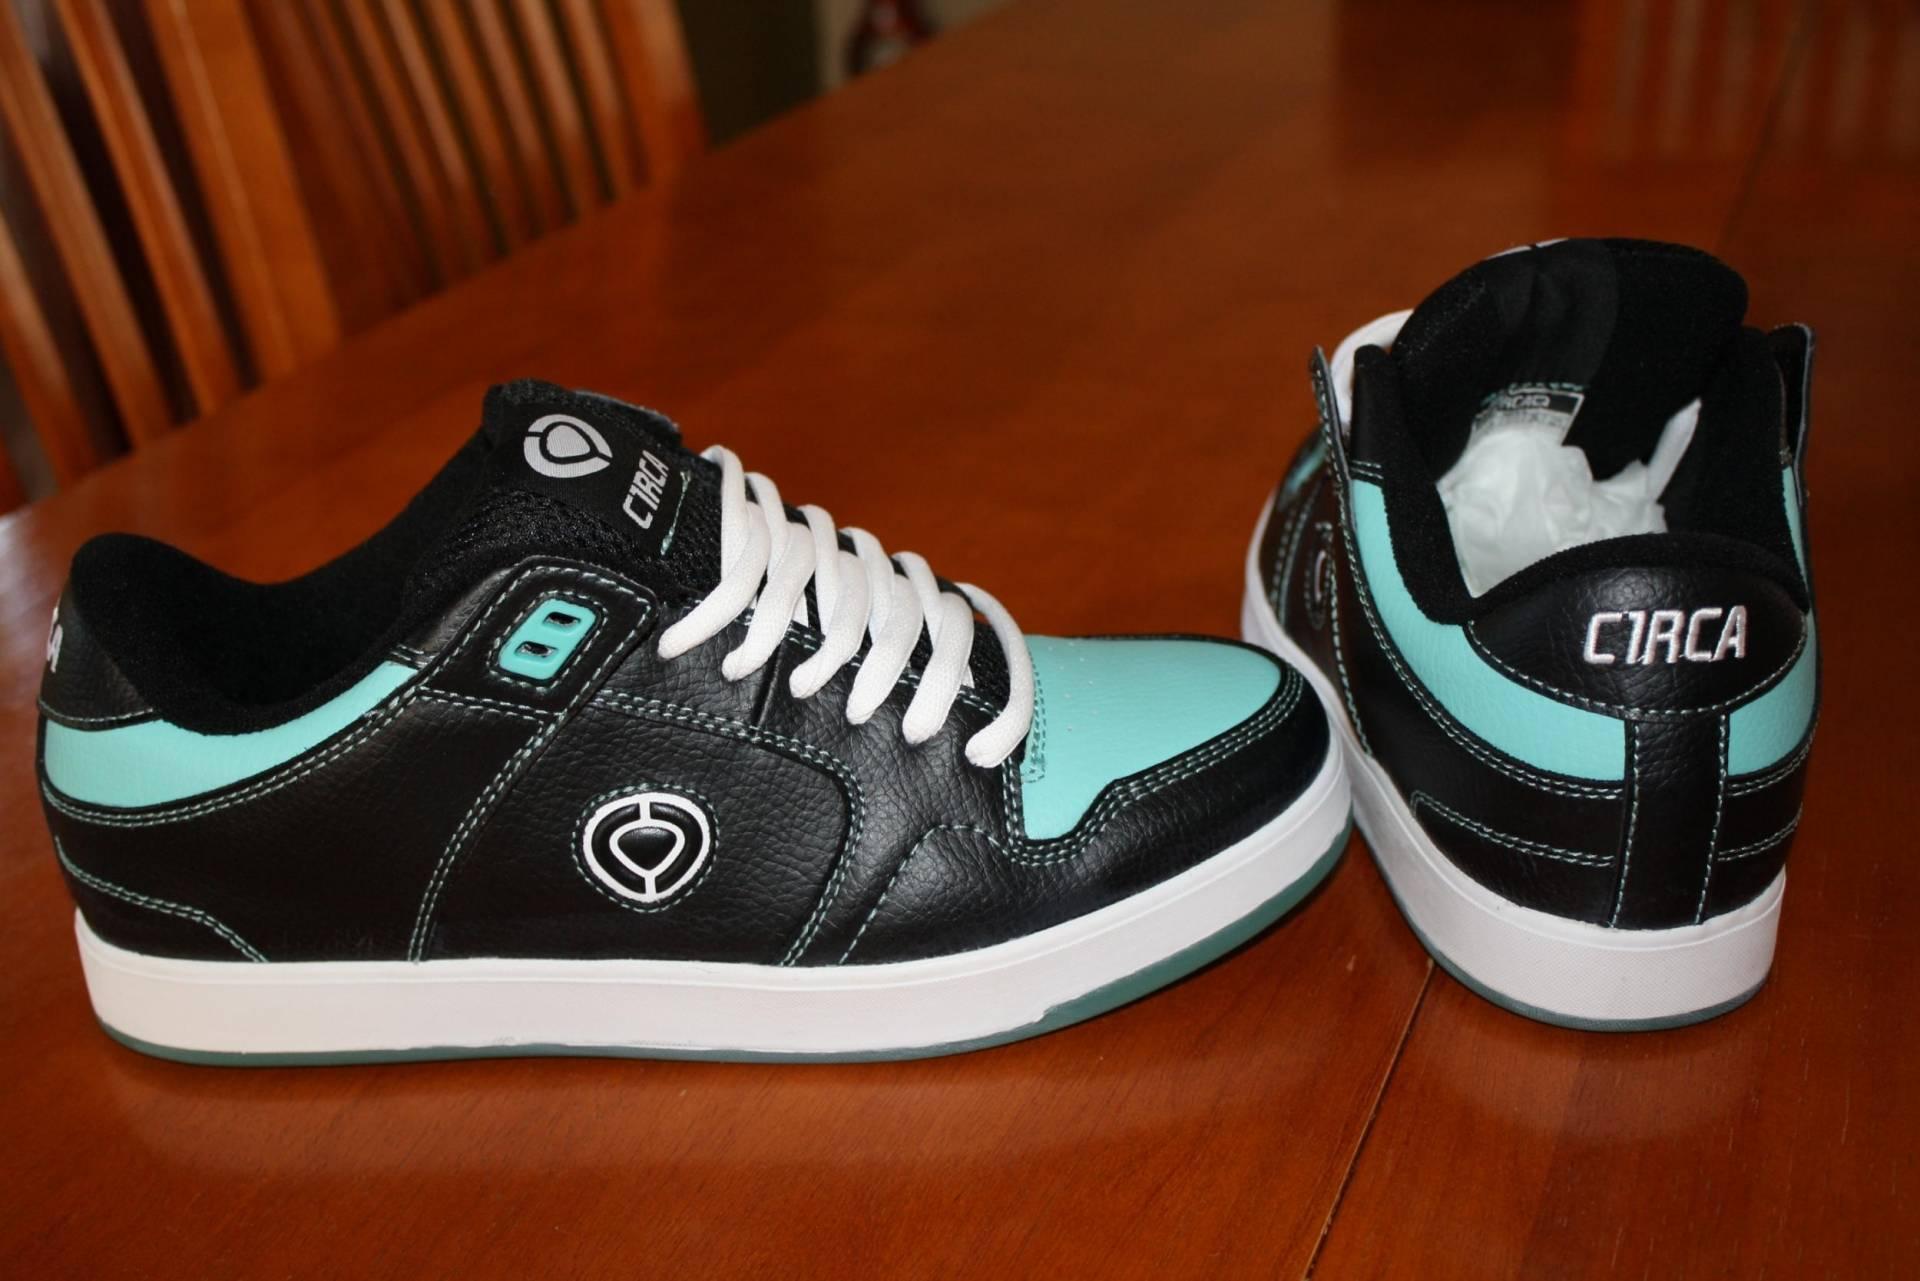 Skate shoes size 9 - File Size 173 6 Kb